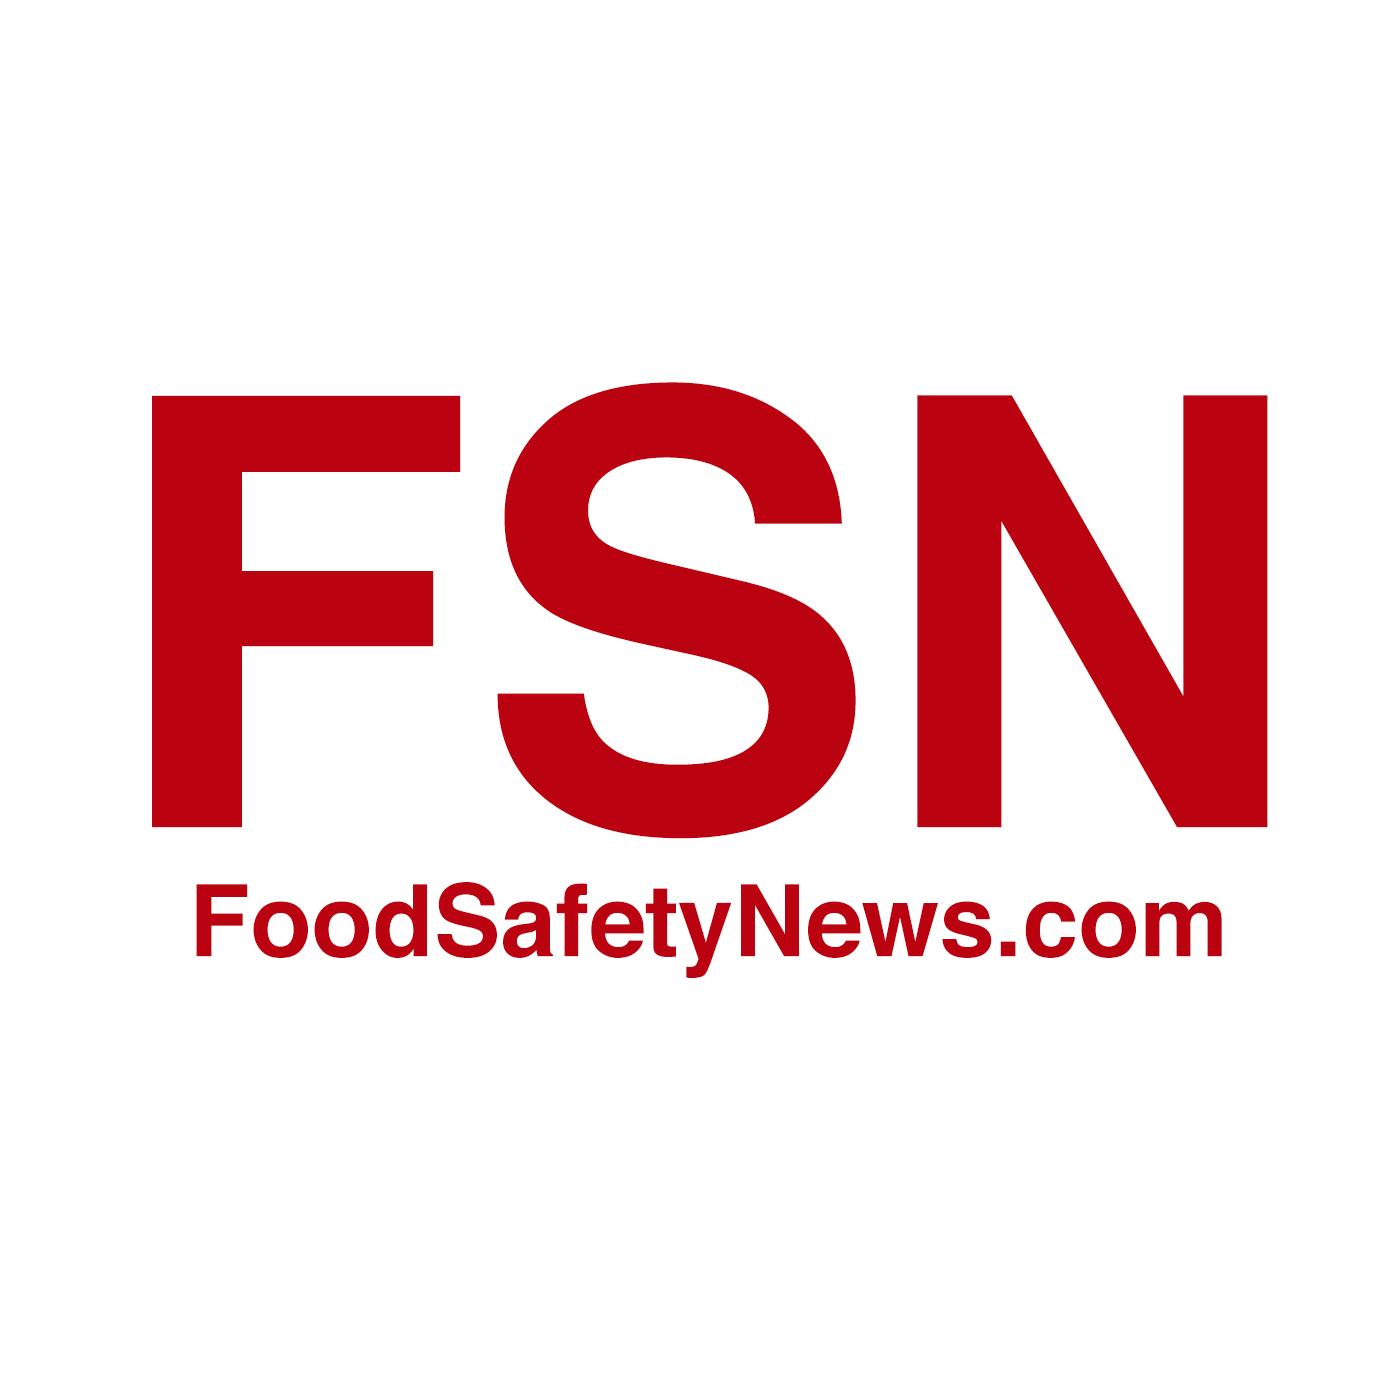 @foodsafetynews